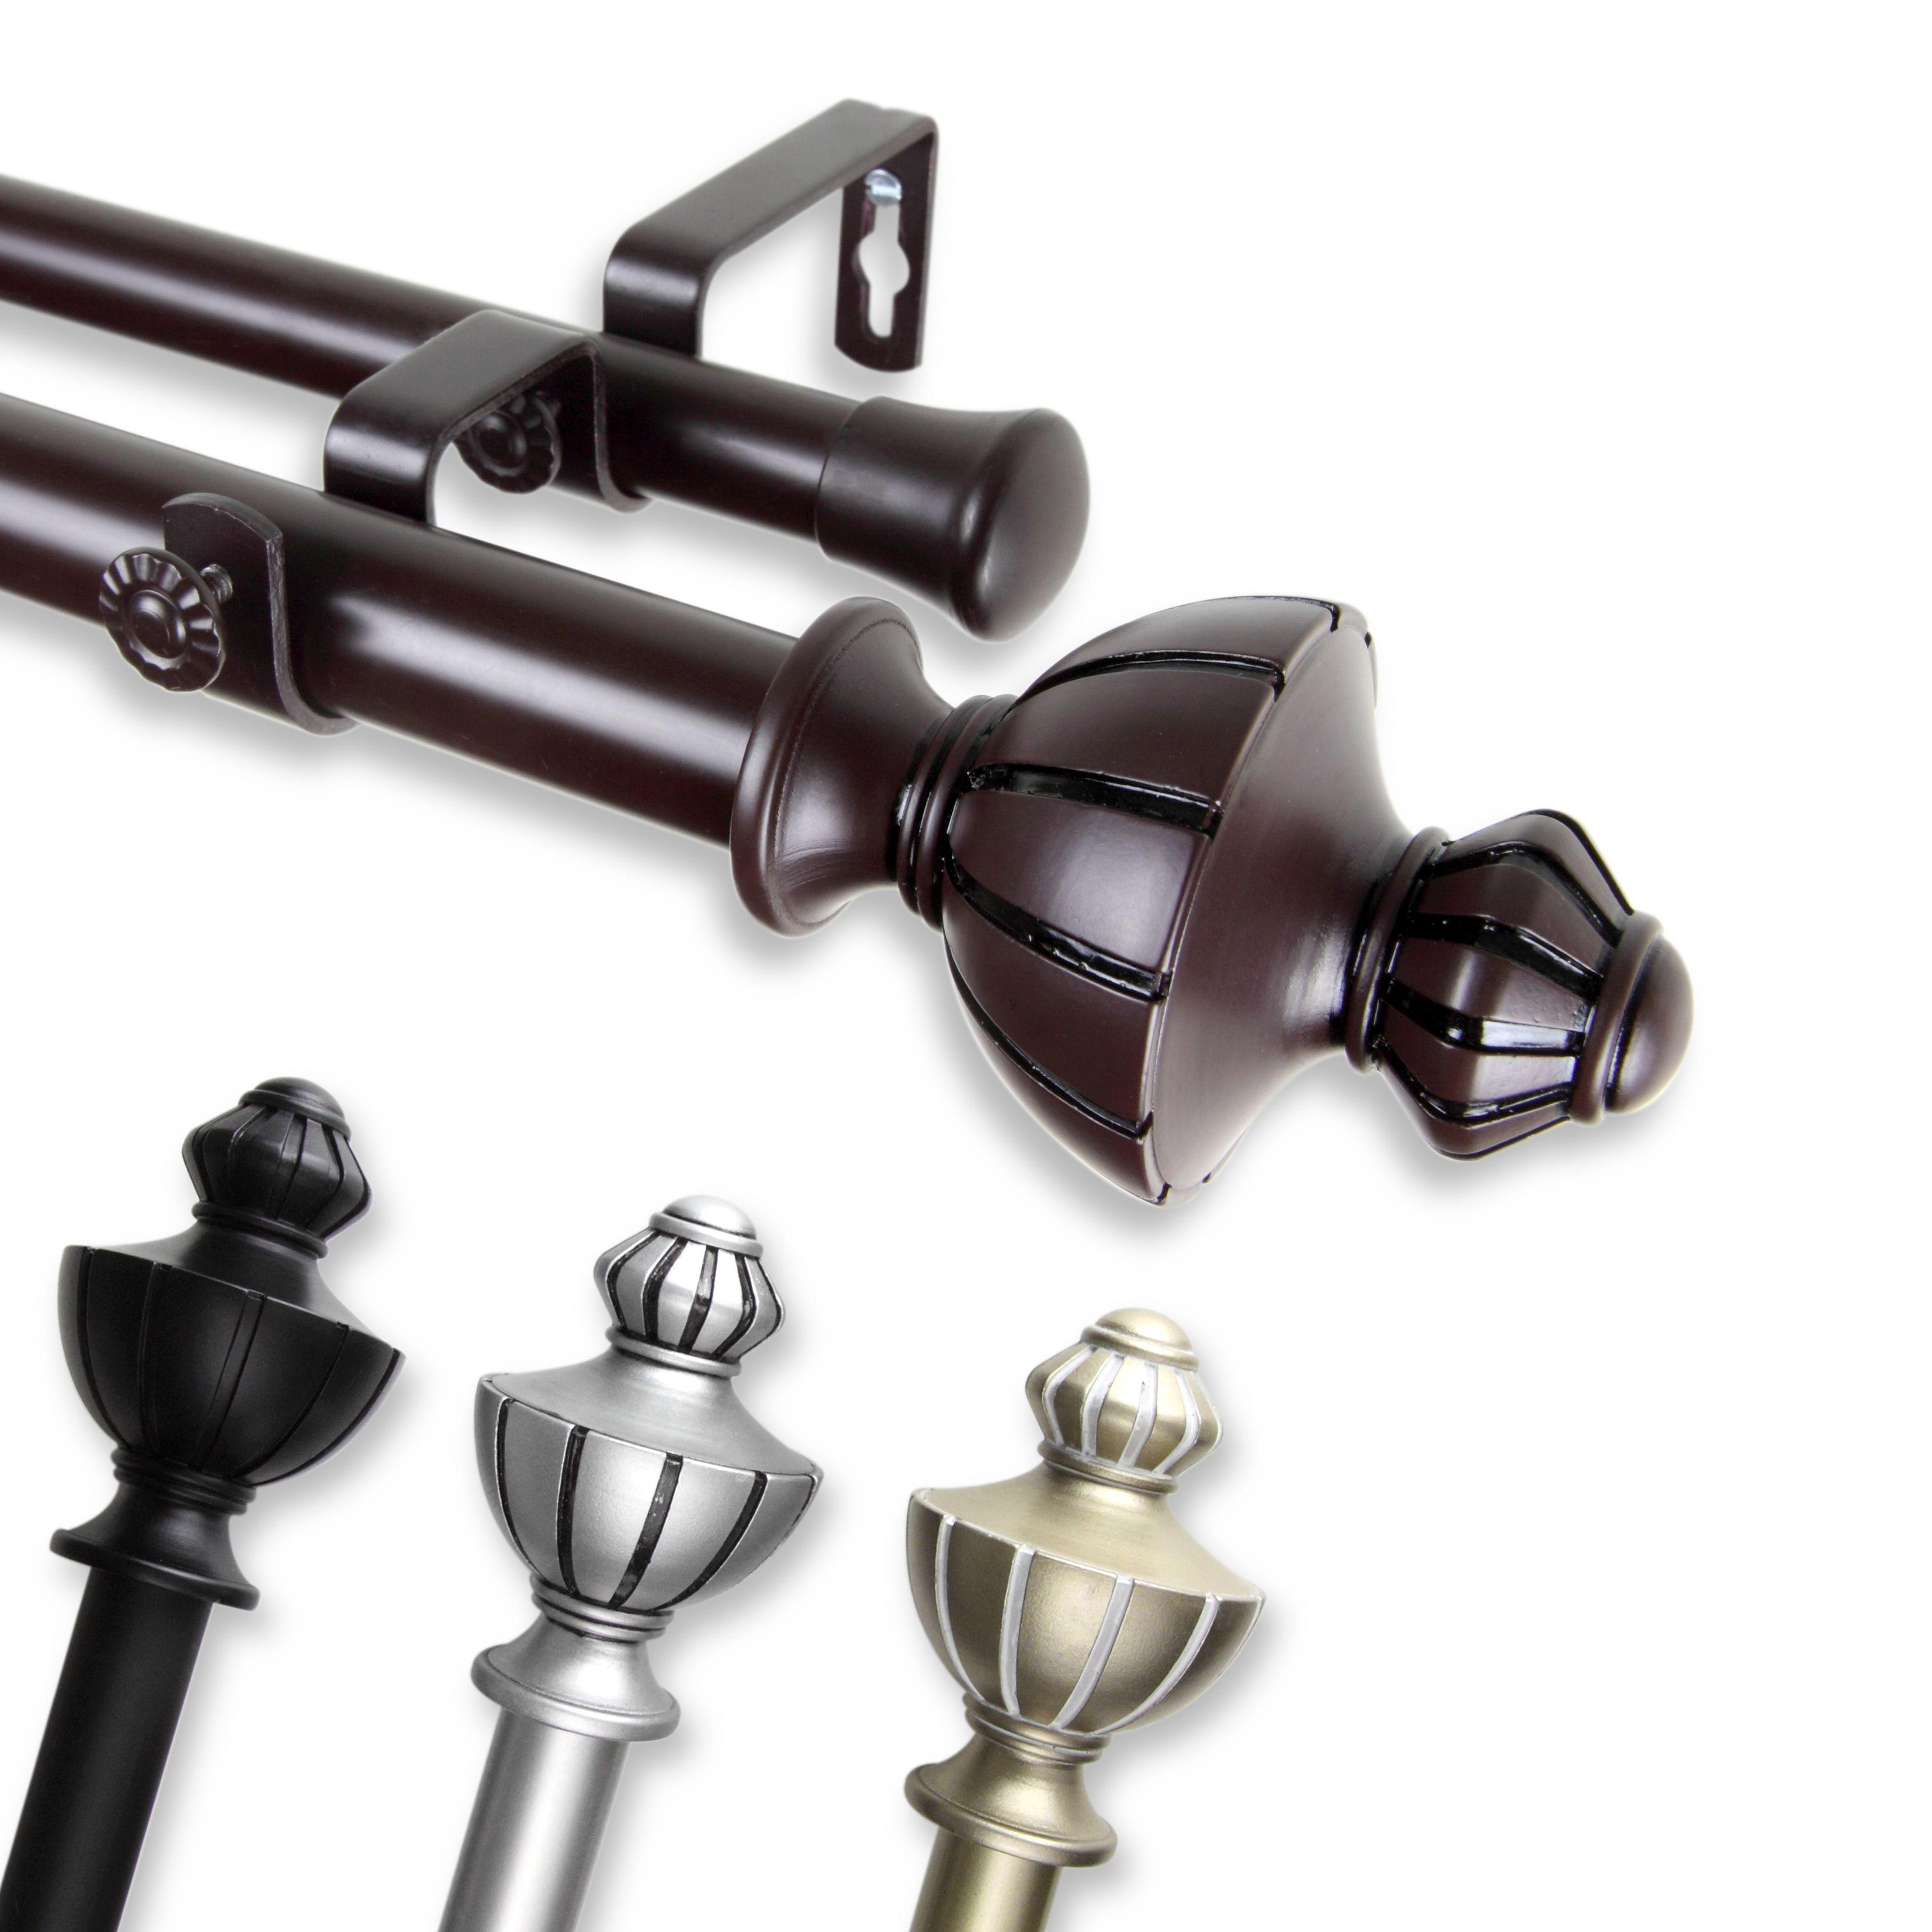 28 to 48-Inch Rod Desyne Fin Adjustable Window Curtain Rod Set Antique Brass